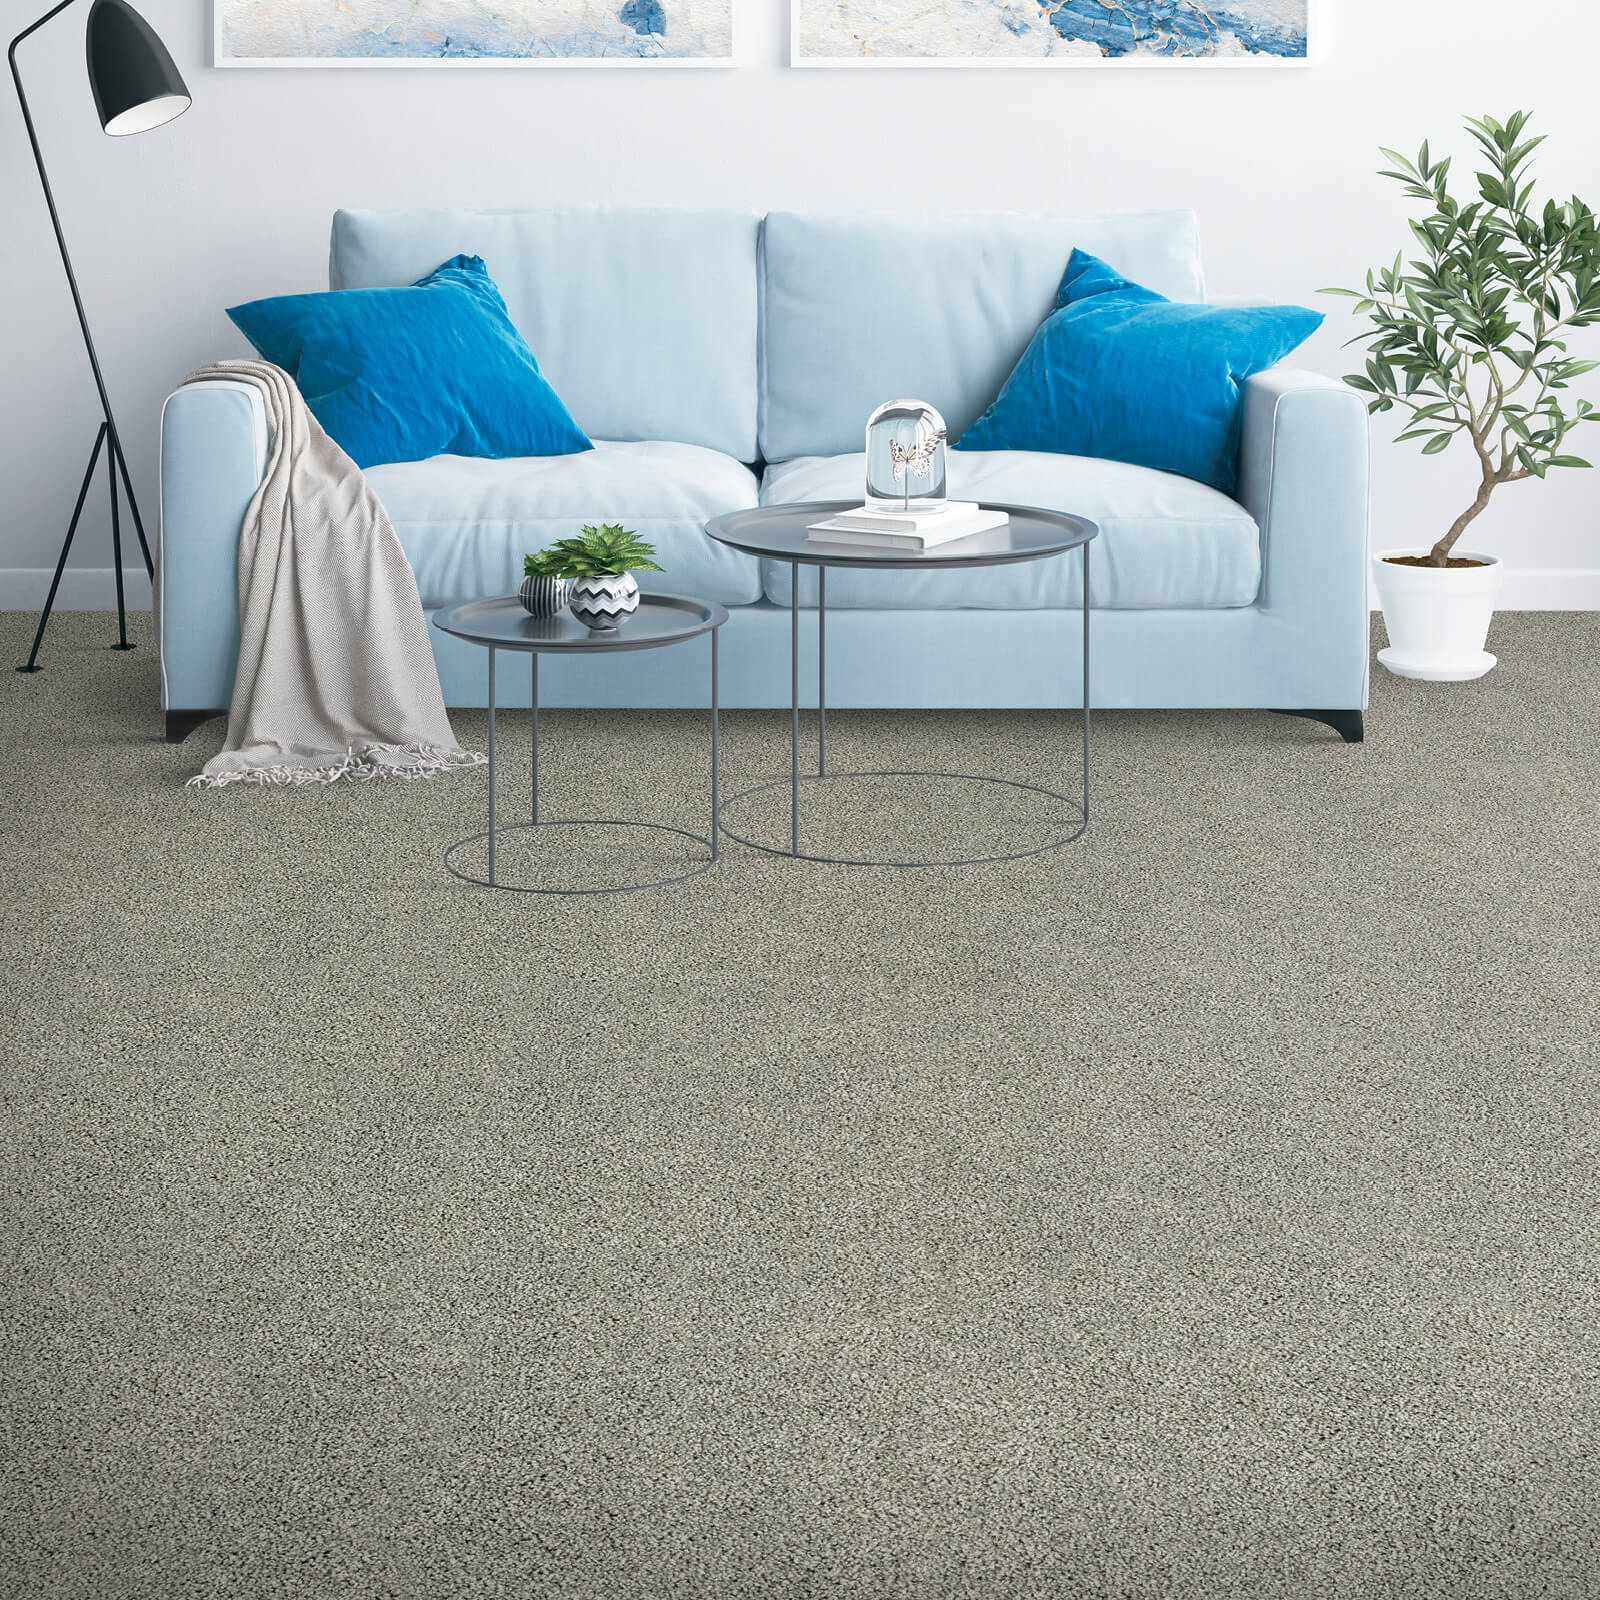 Placid Reflection | McSwain Carpet & Floors